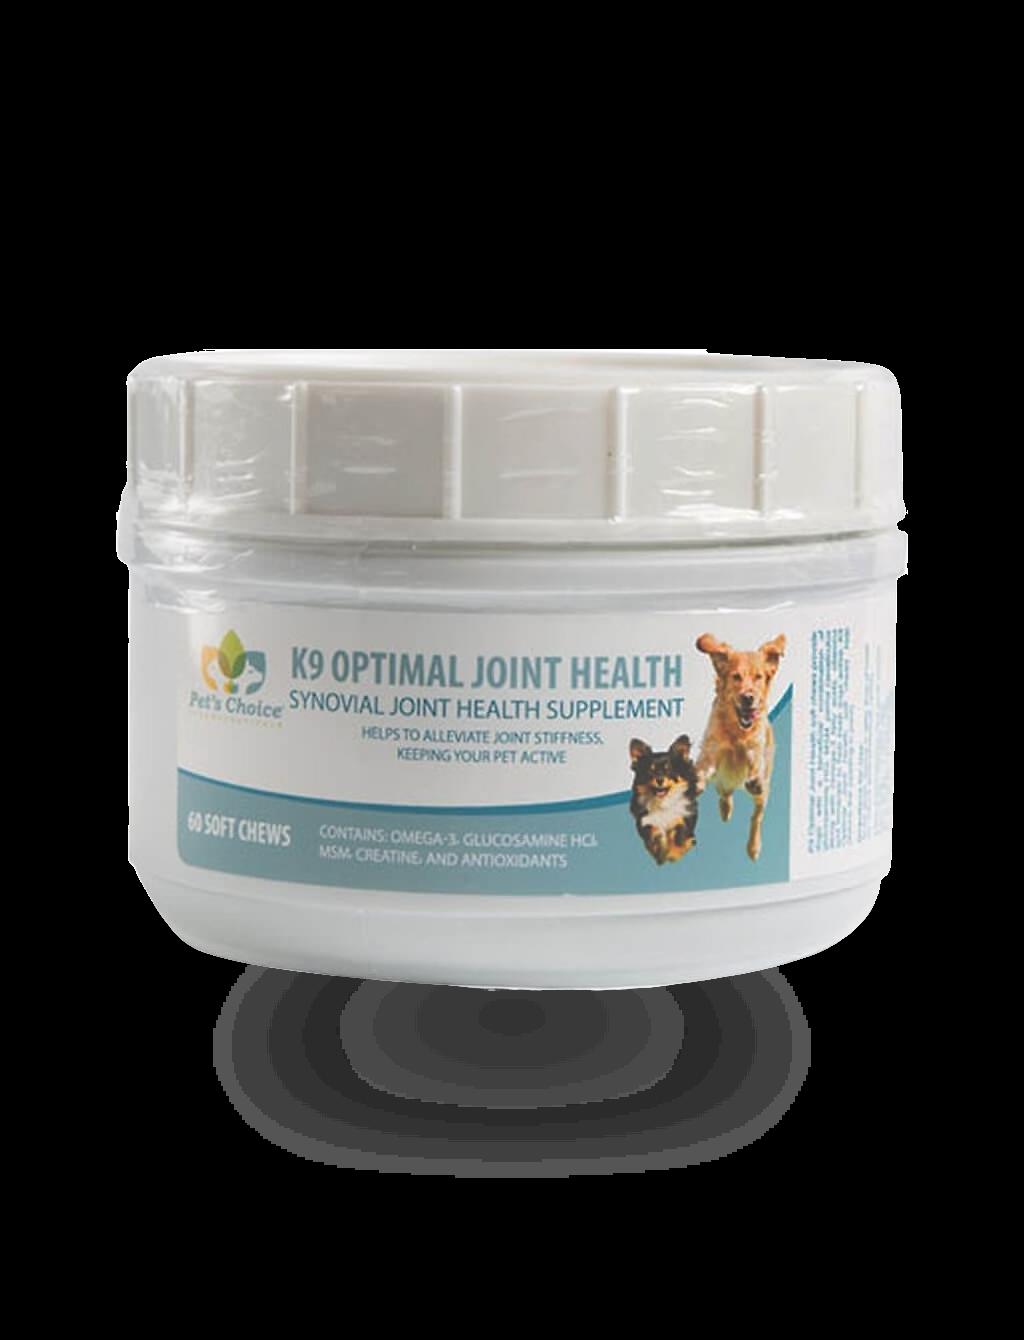 K9 Optimal Joint Health, 60 ct.